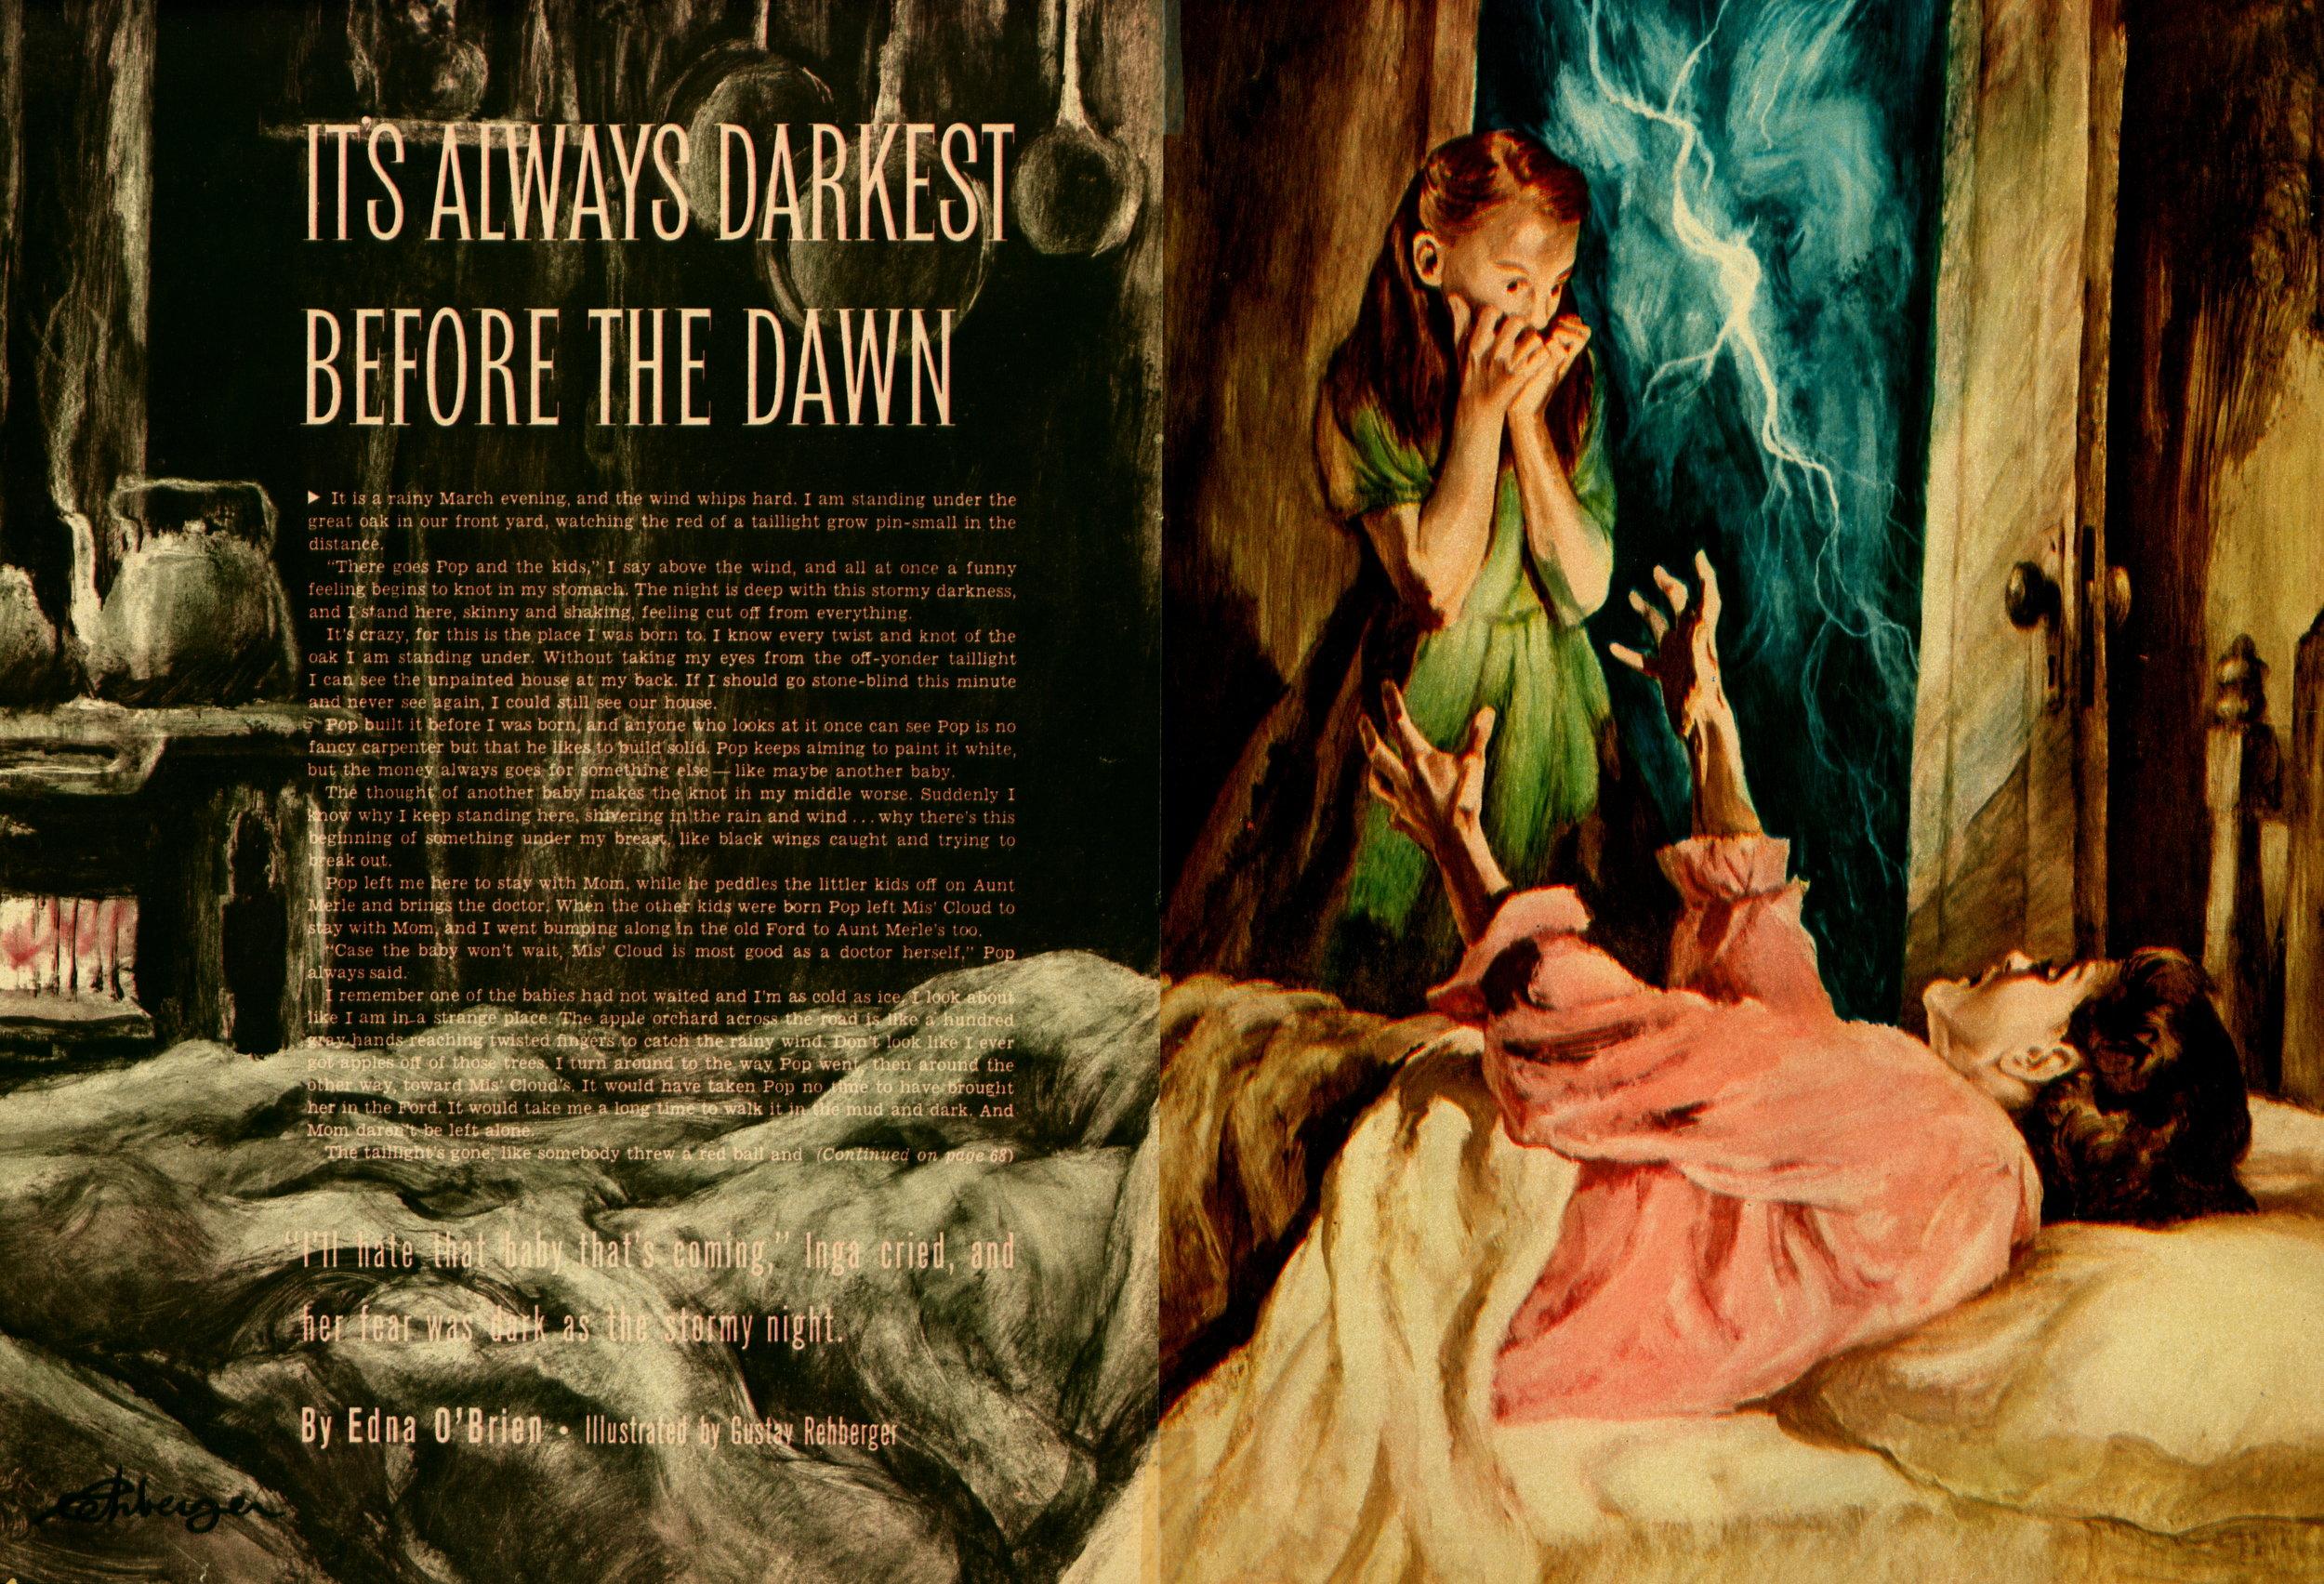 February 1956 - It's Always Darkest Before the Dawn